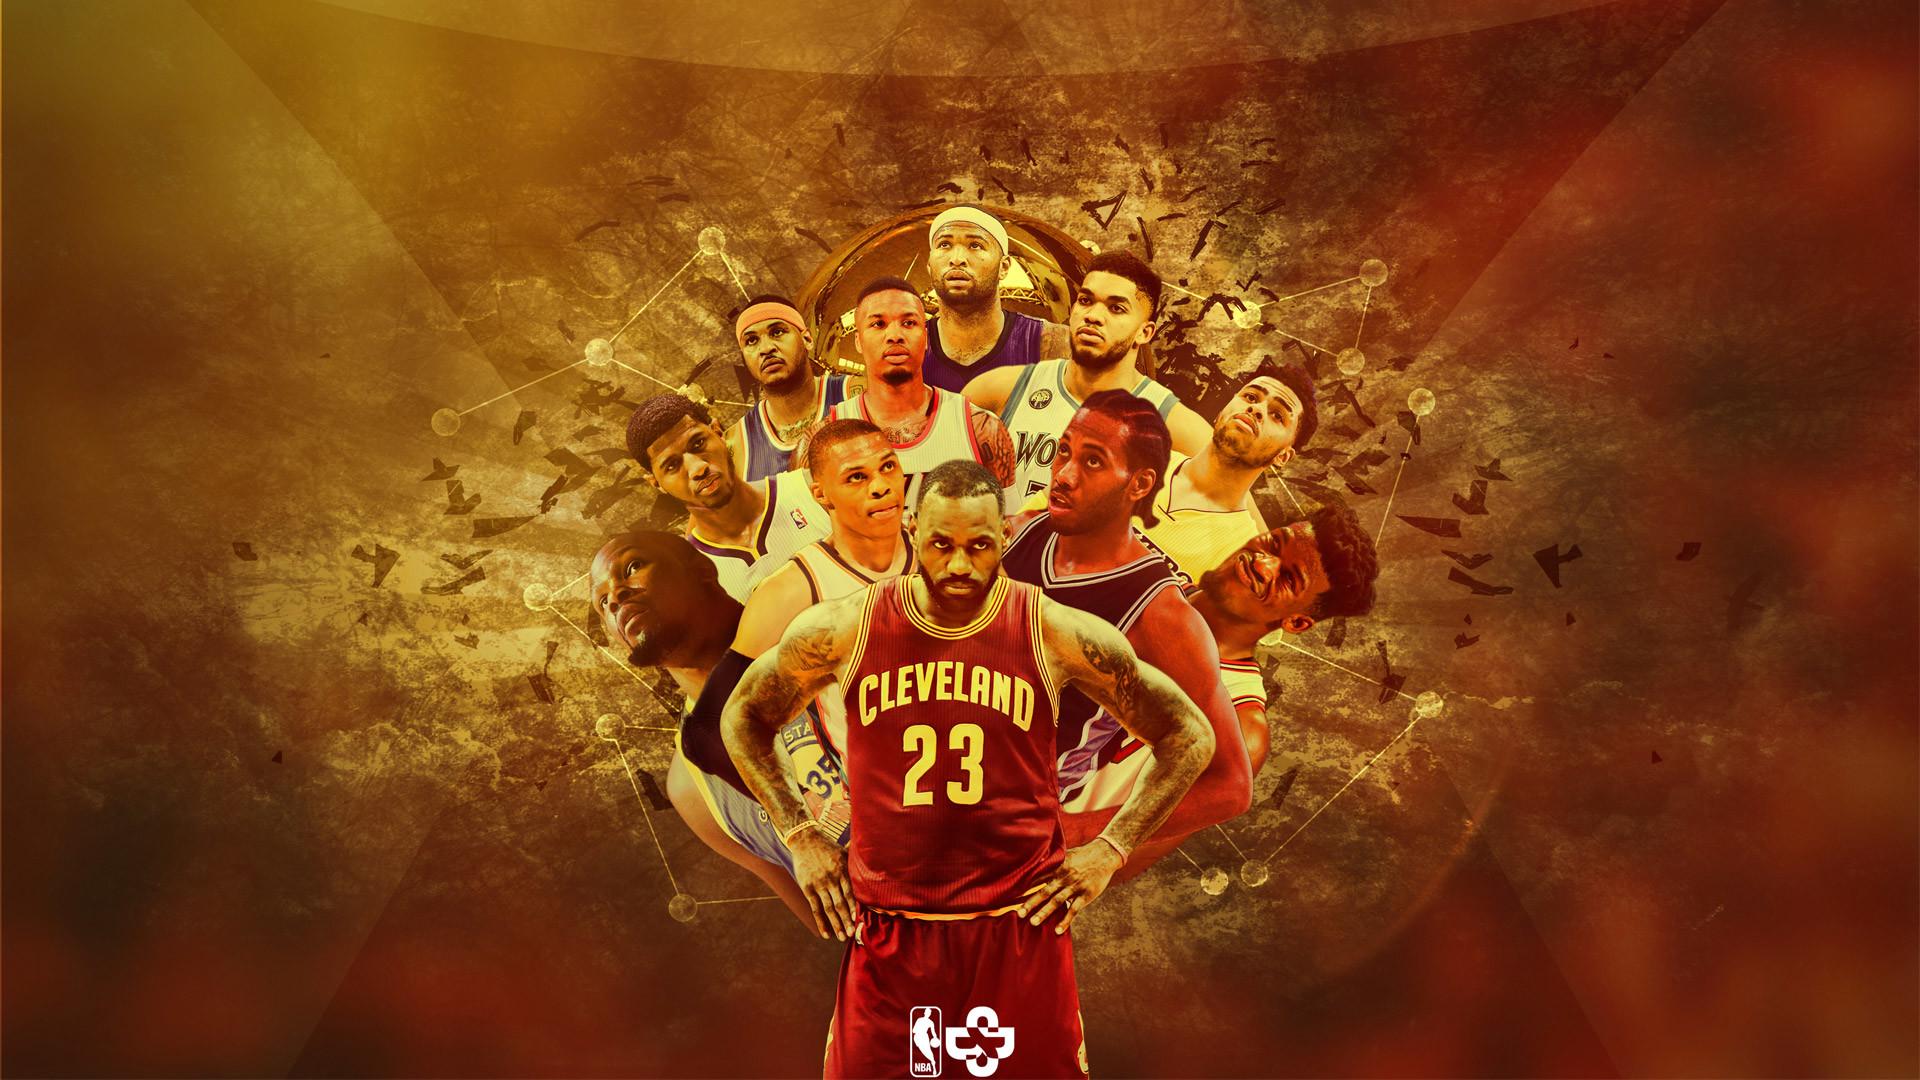 Nba Wallpaper Home: NBA Players Wallpapers (71+ Images